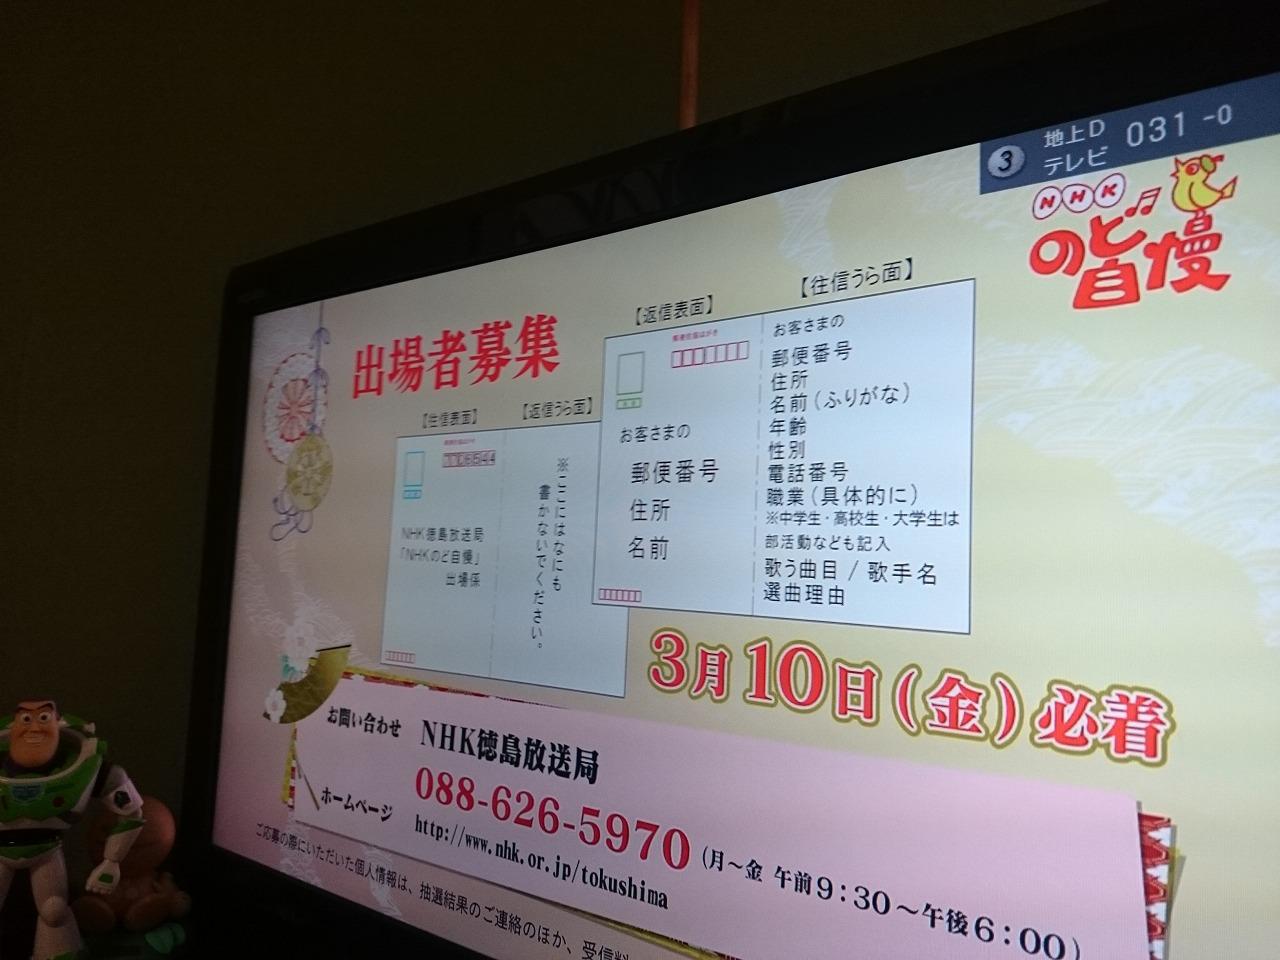 NHK のど自慢 徳島文理大学生 マンション